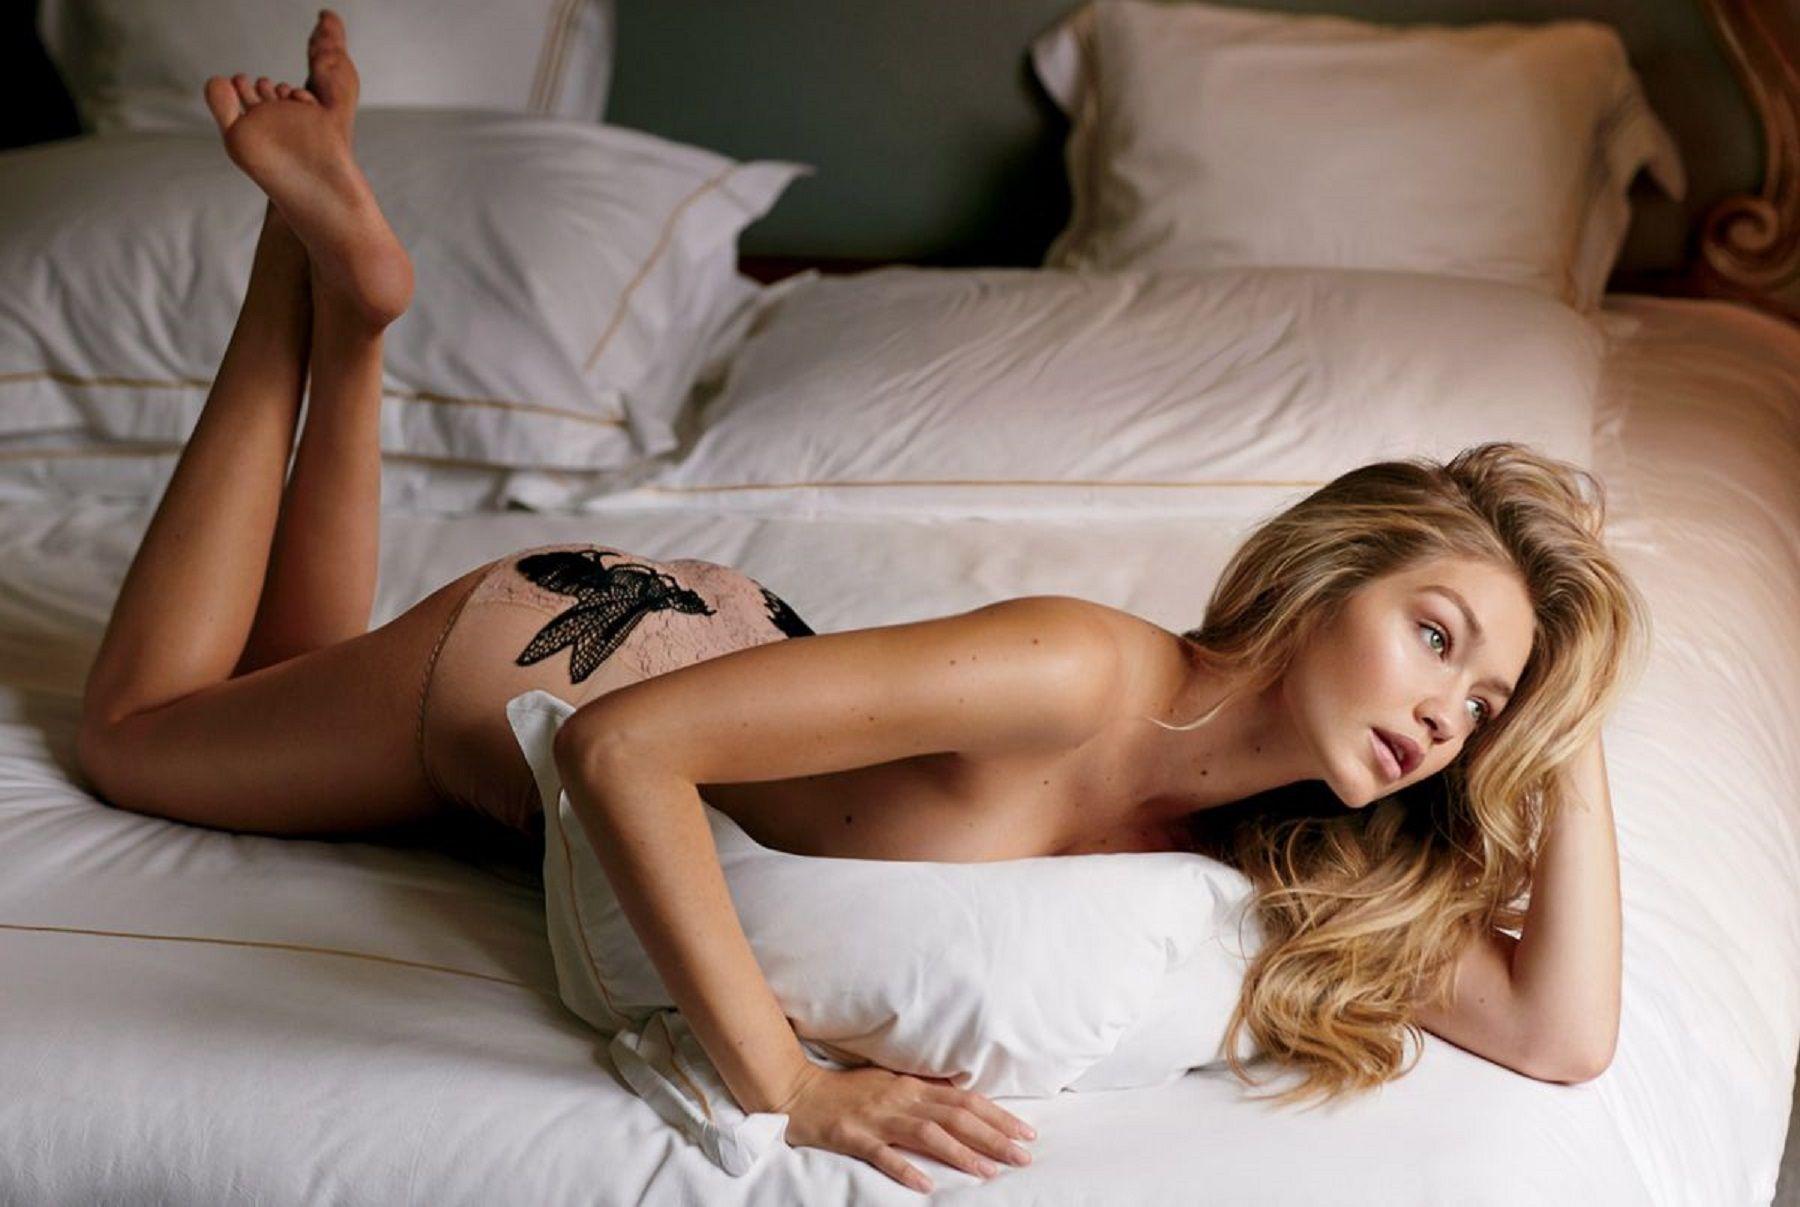 15 Most Revealing Photos Of Gigi Hadid